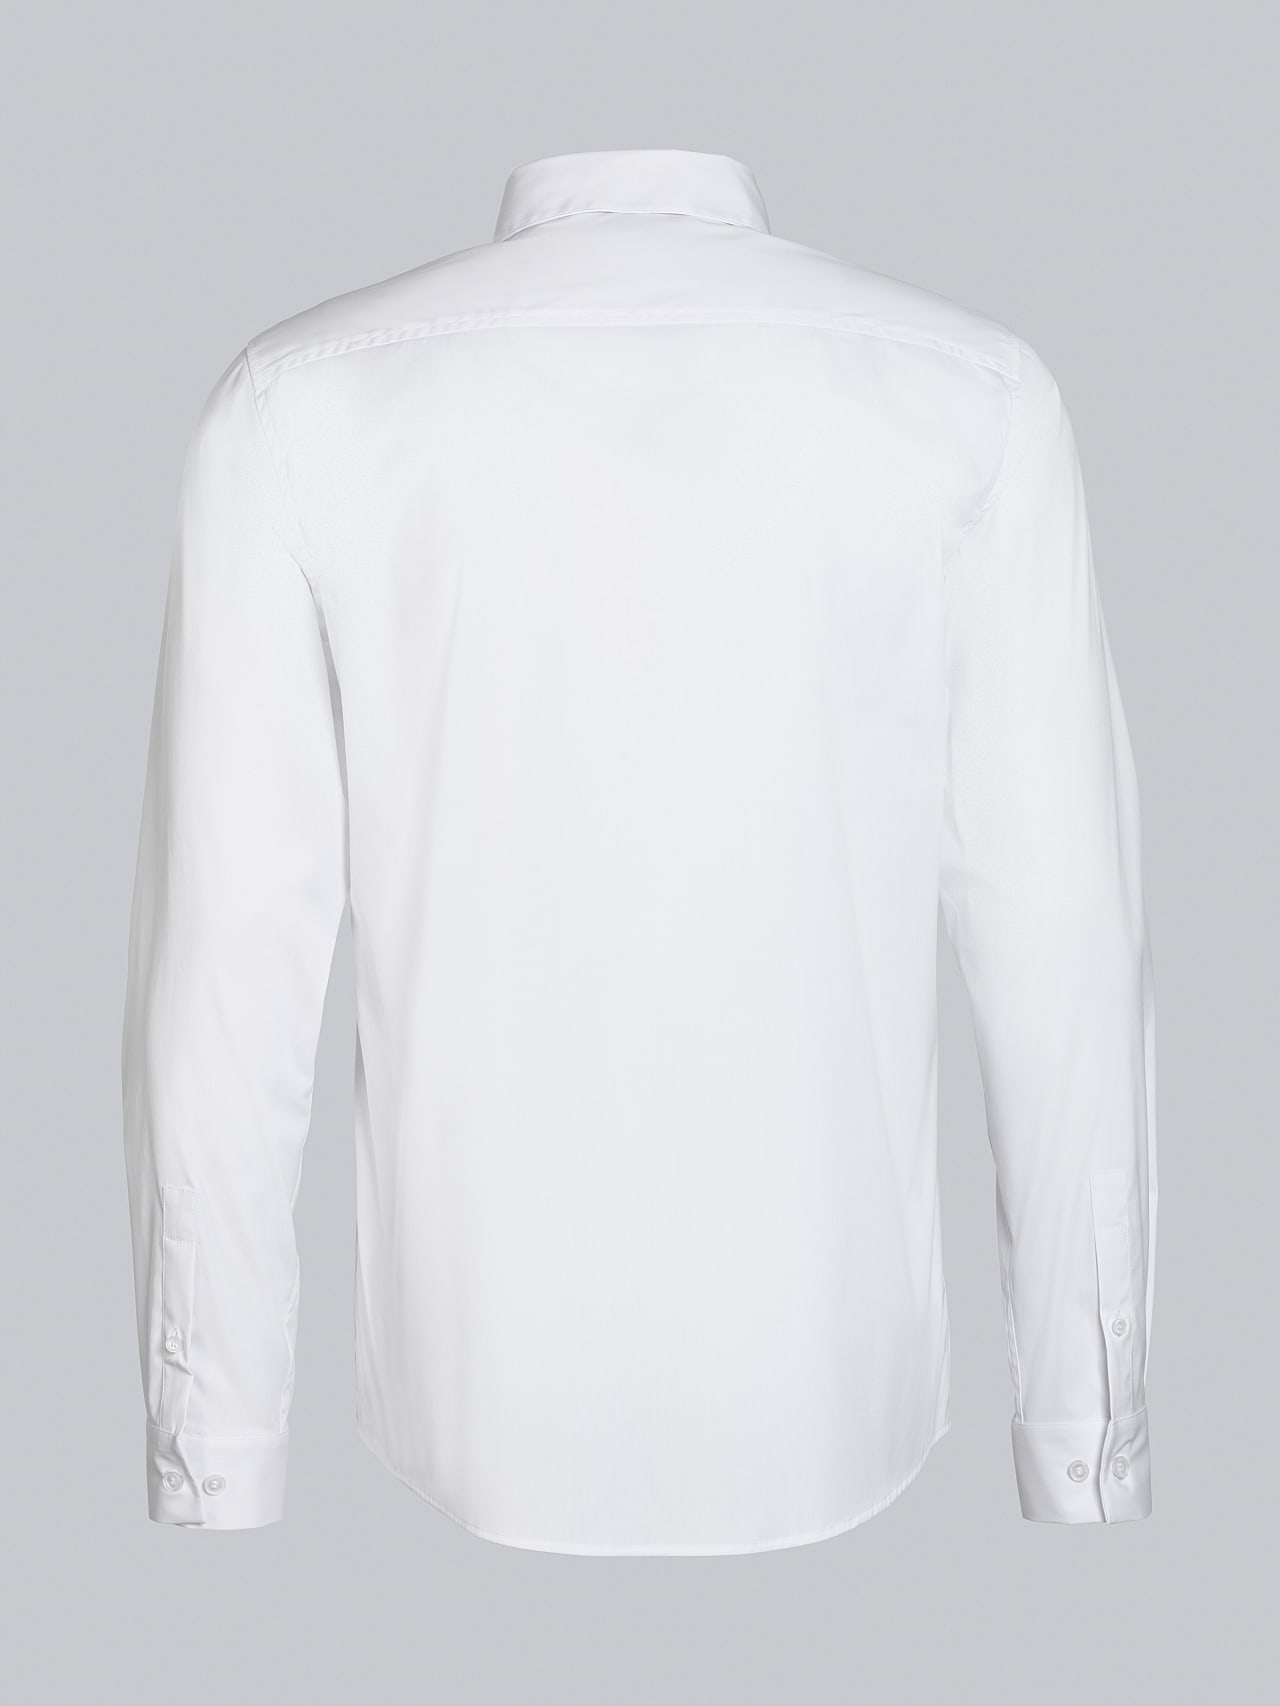 WAARG V2.Y5.02 Easy-Care Cotton Shirt white Left Alpha Tauri